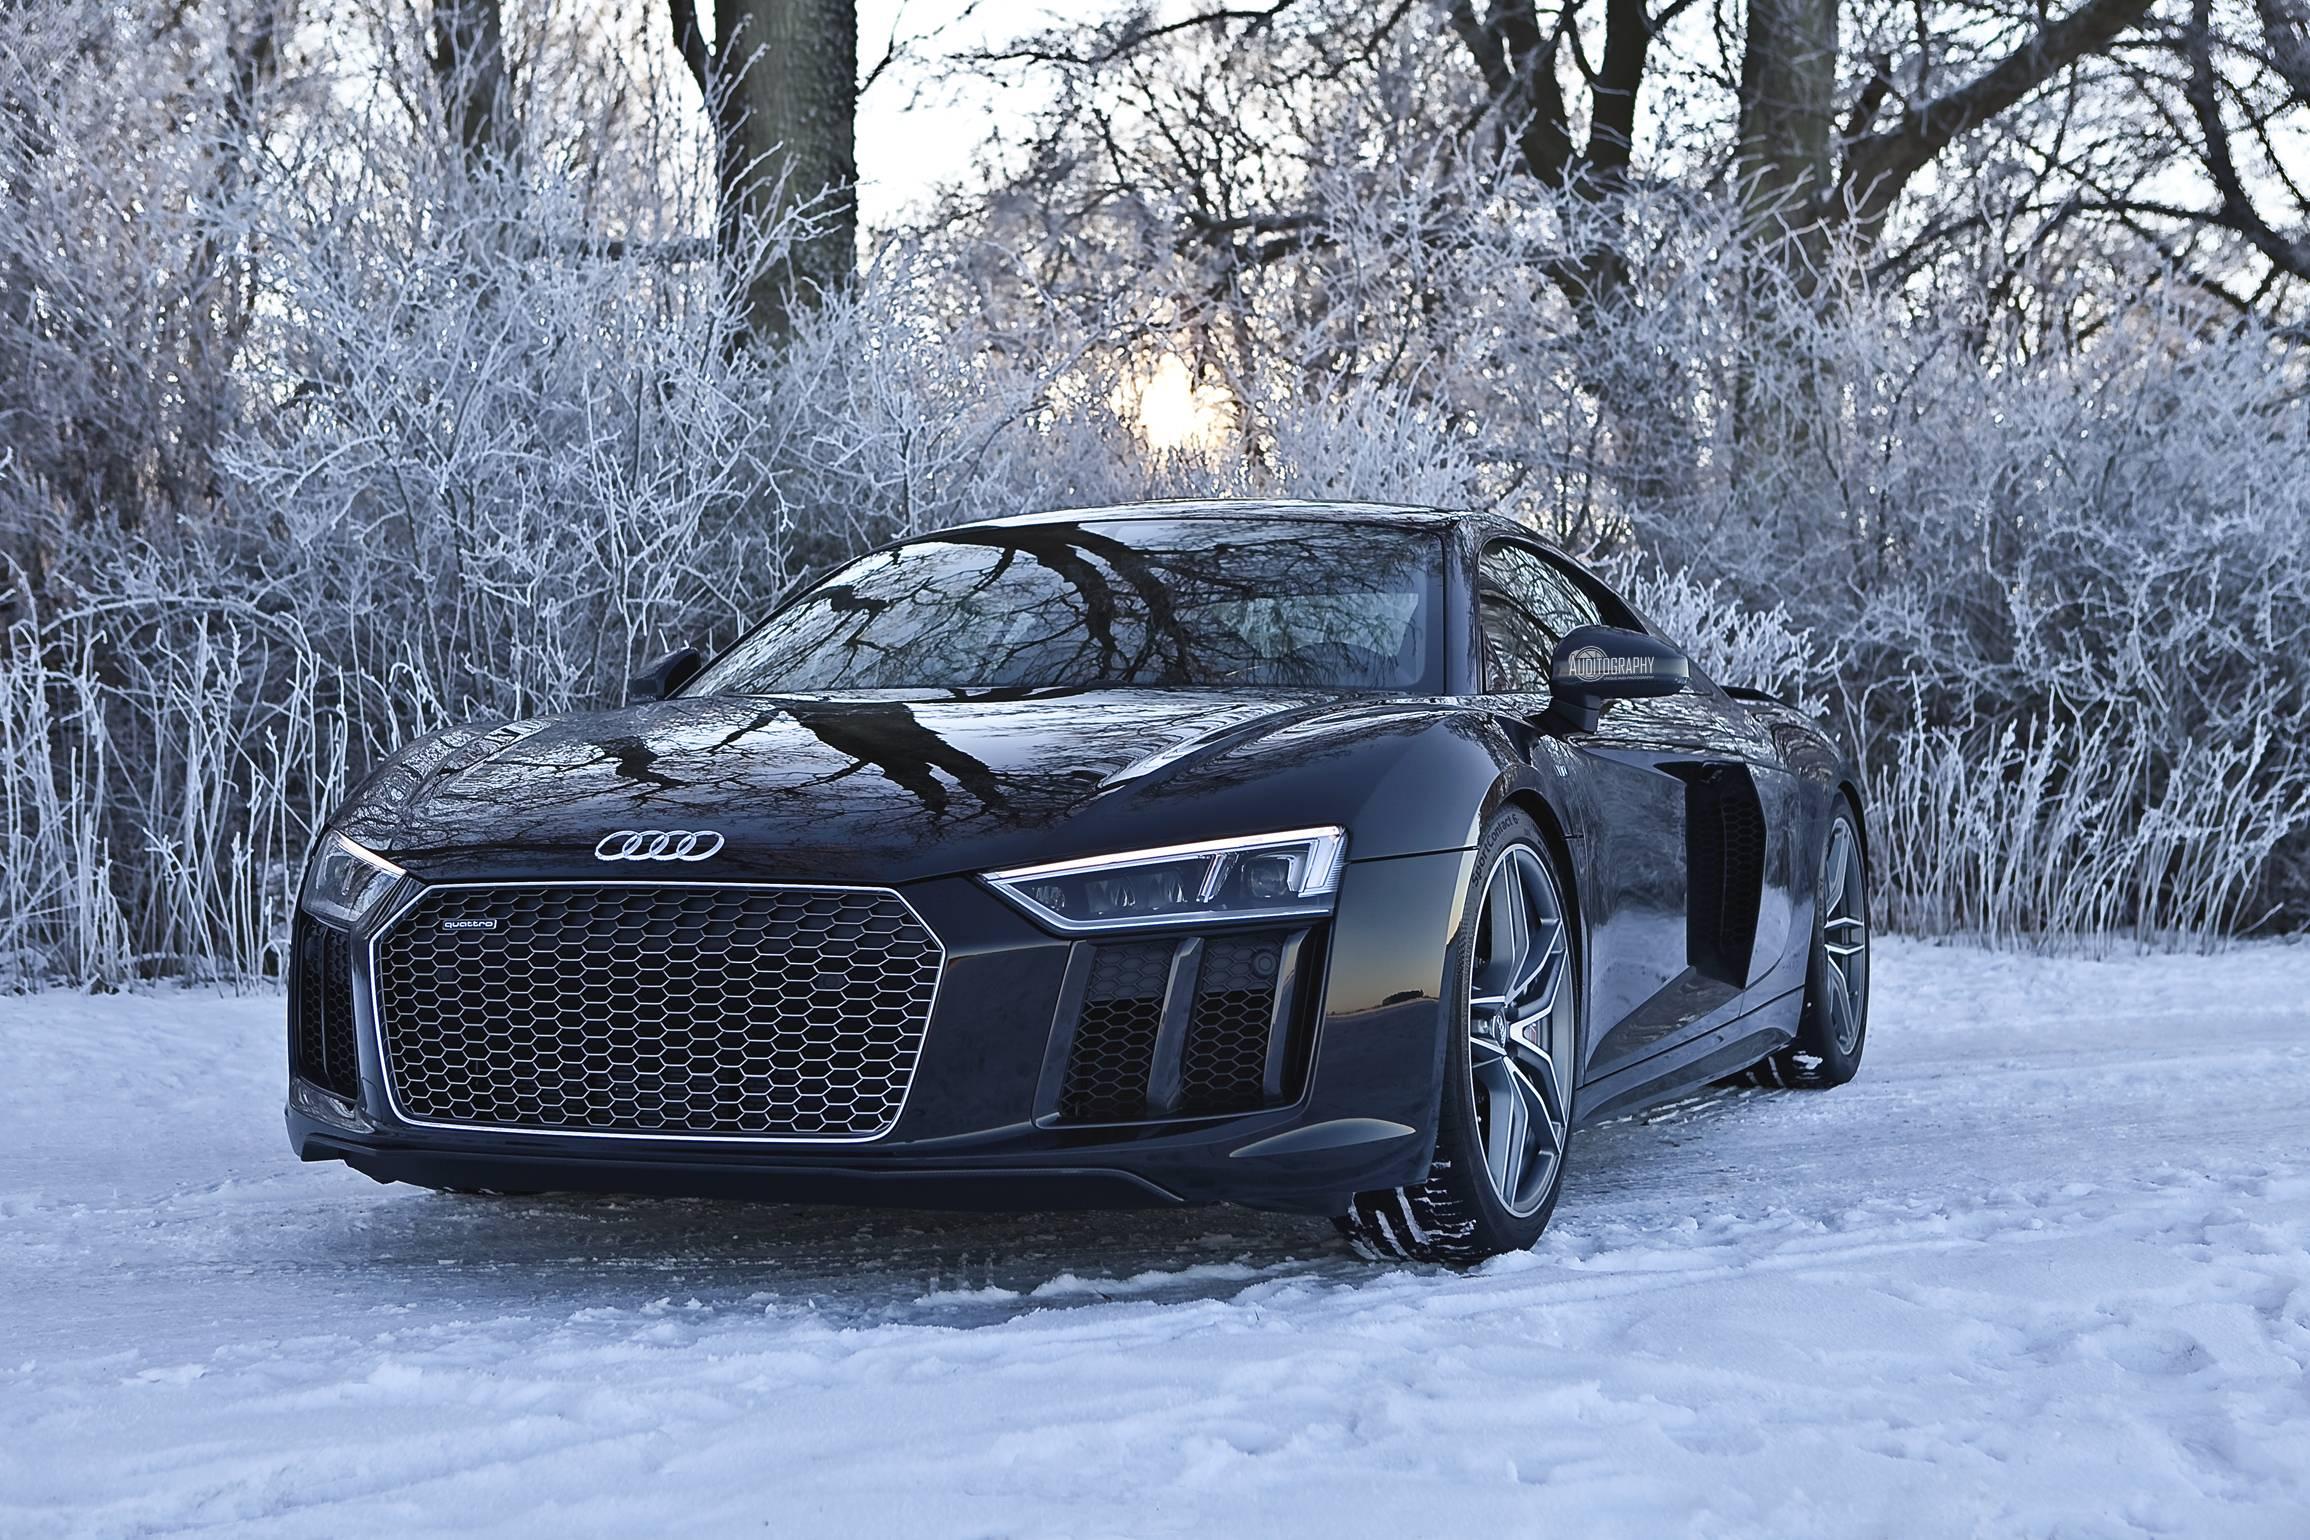 Audi R8 V10 Plus 2016 Full Hd Fond D 233 Cran And Arri 232 Re